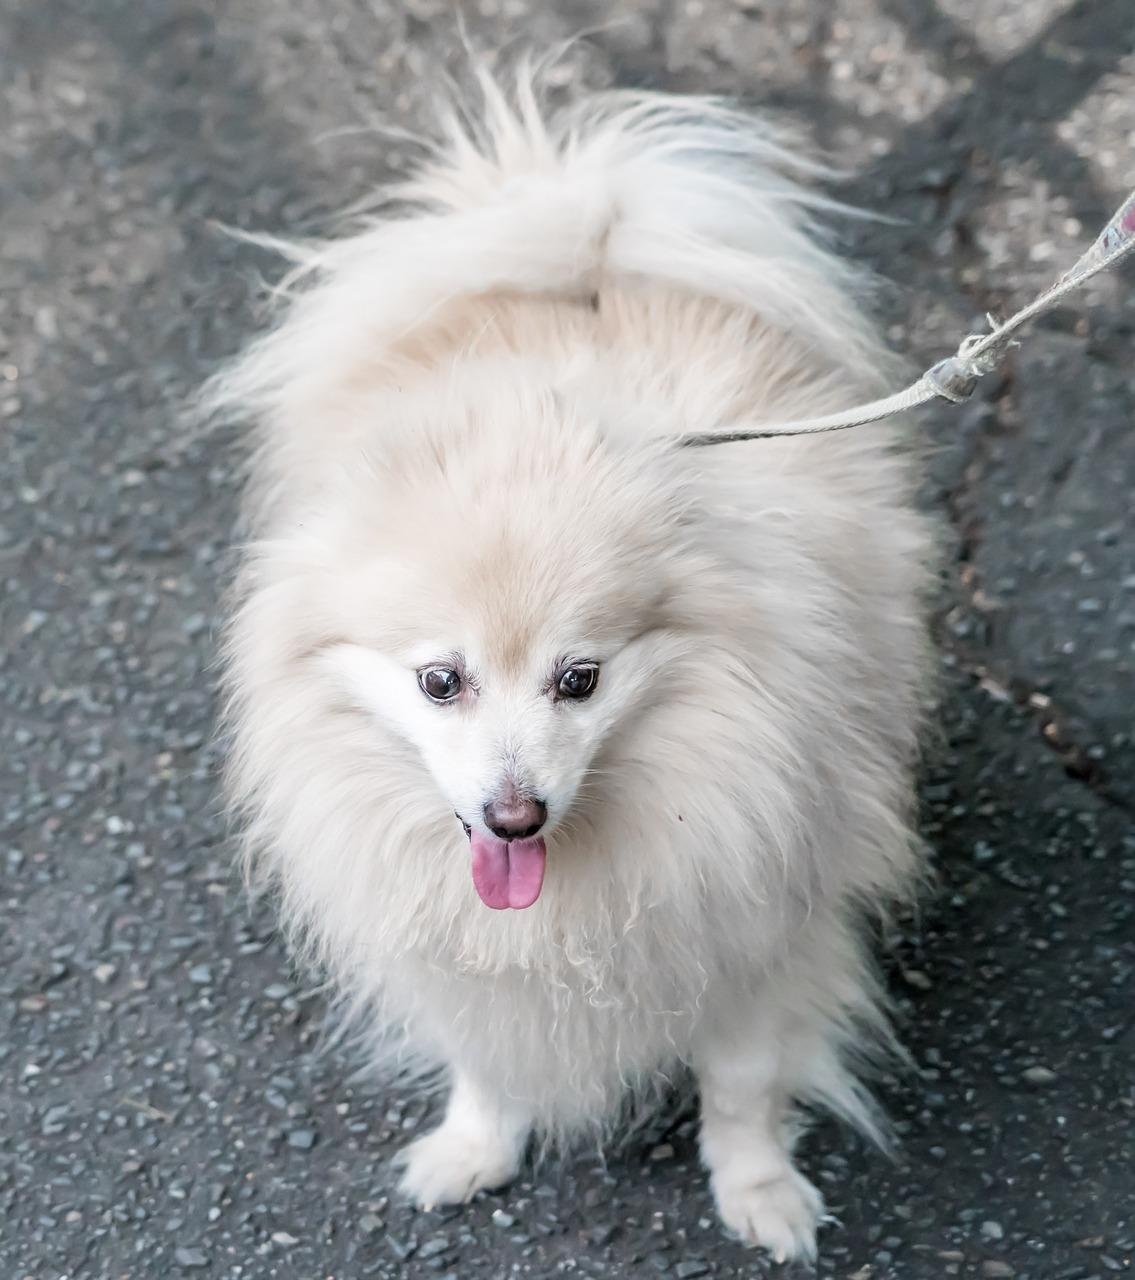 Dog Pomeranian White Cute Pet Free Photo From Needpix Com